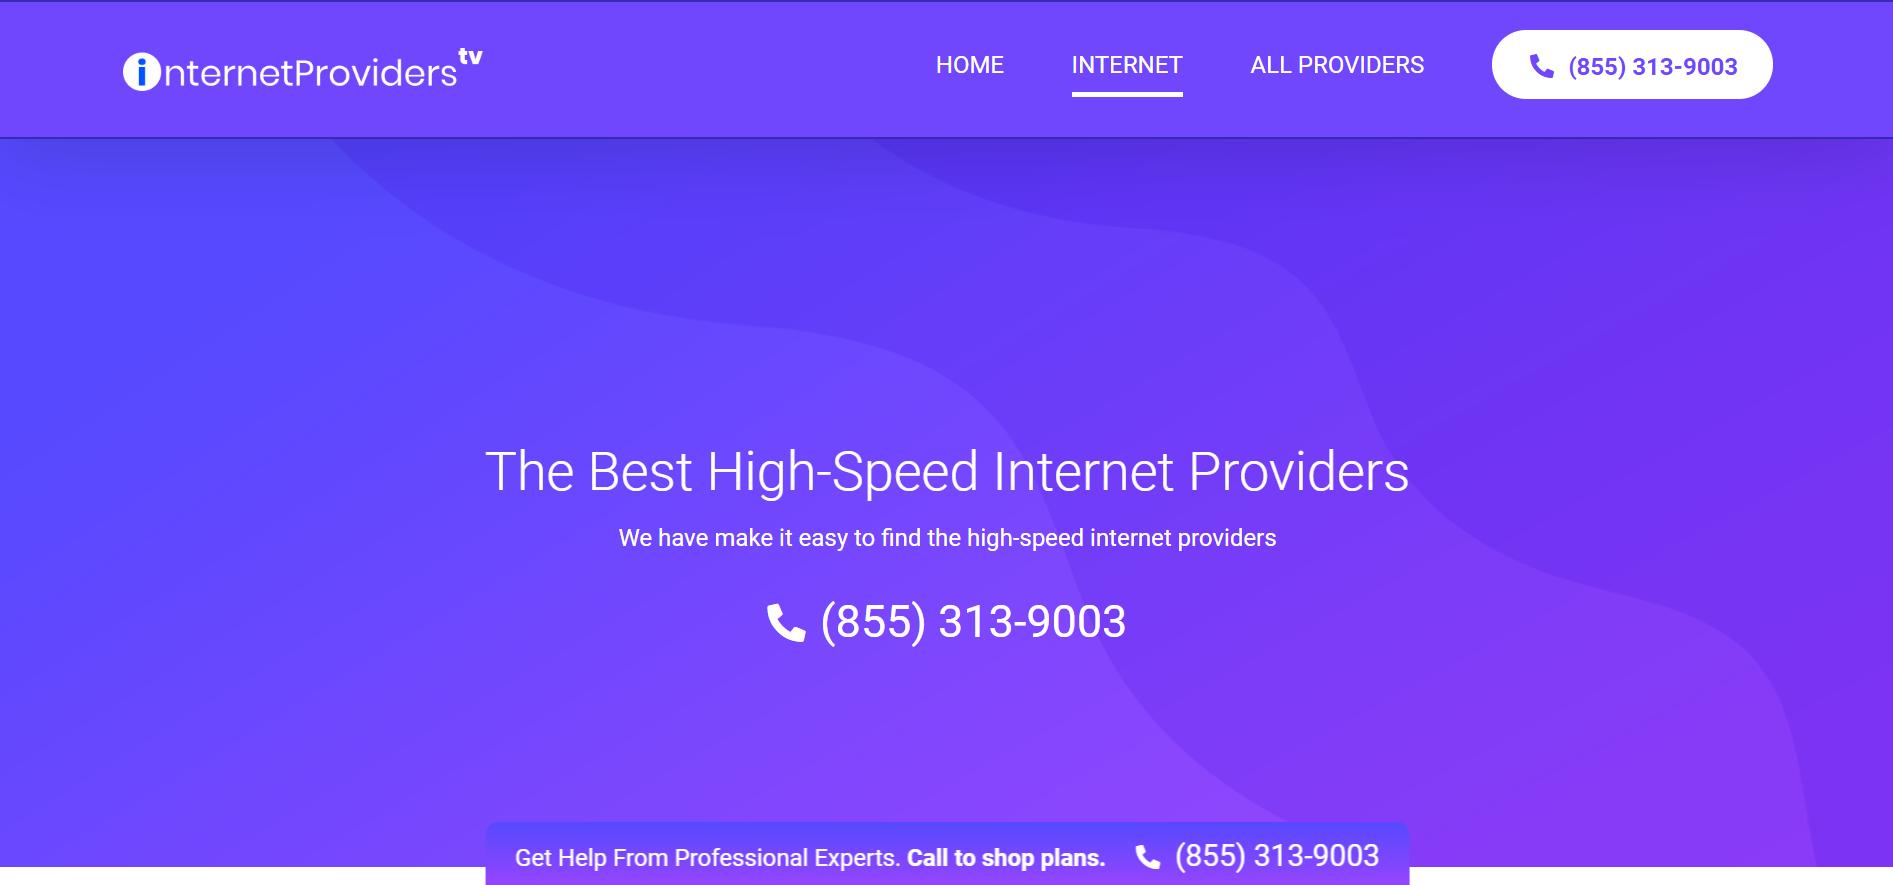 a4304f3395524623b986a80d7b4a71d3 - How To Get High Speed Internet In My Area